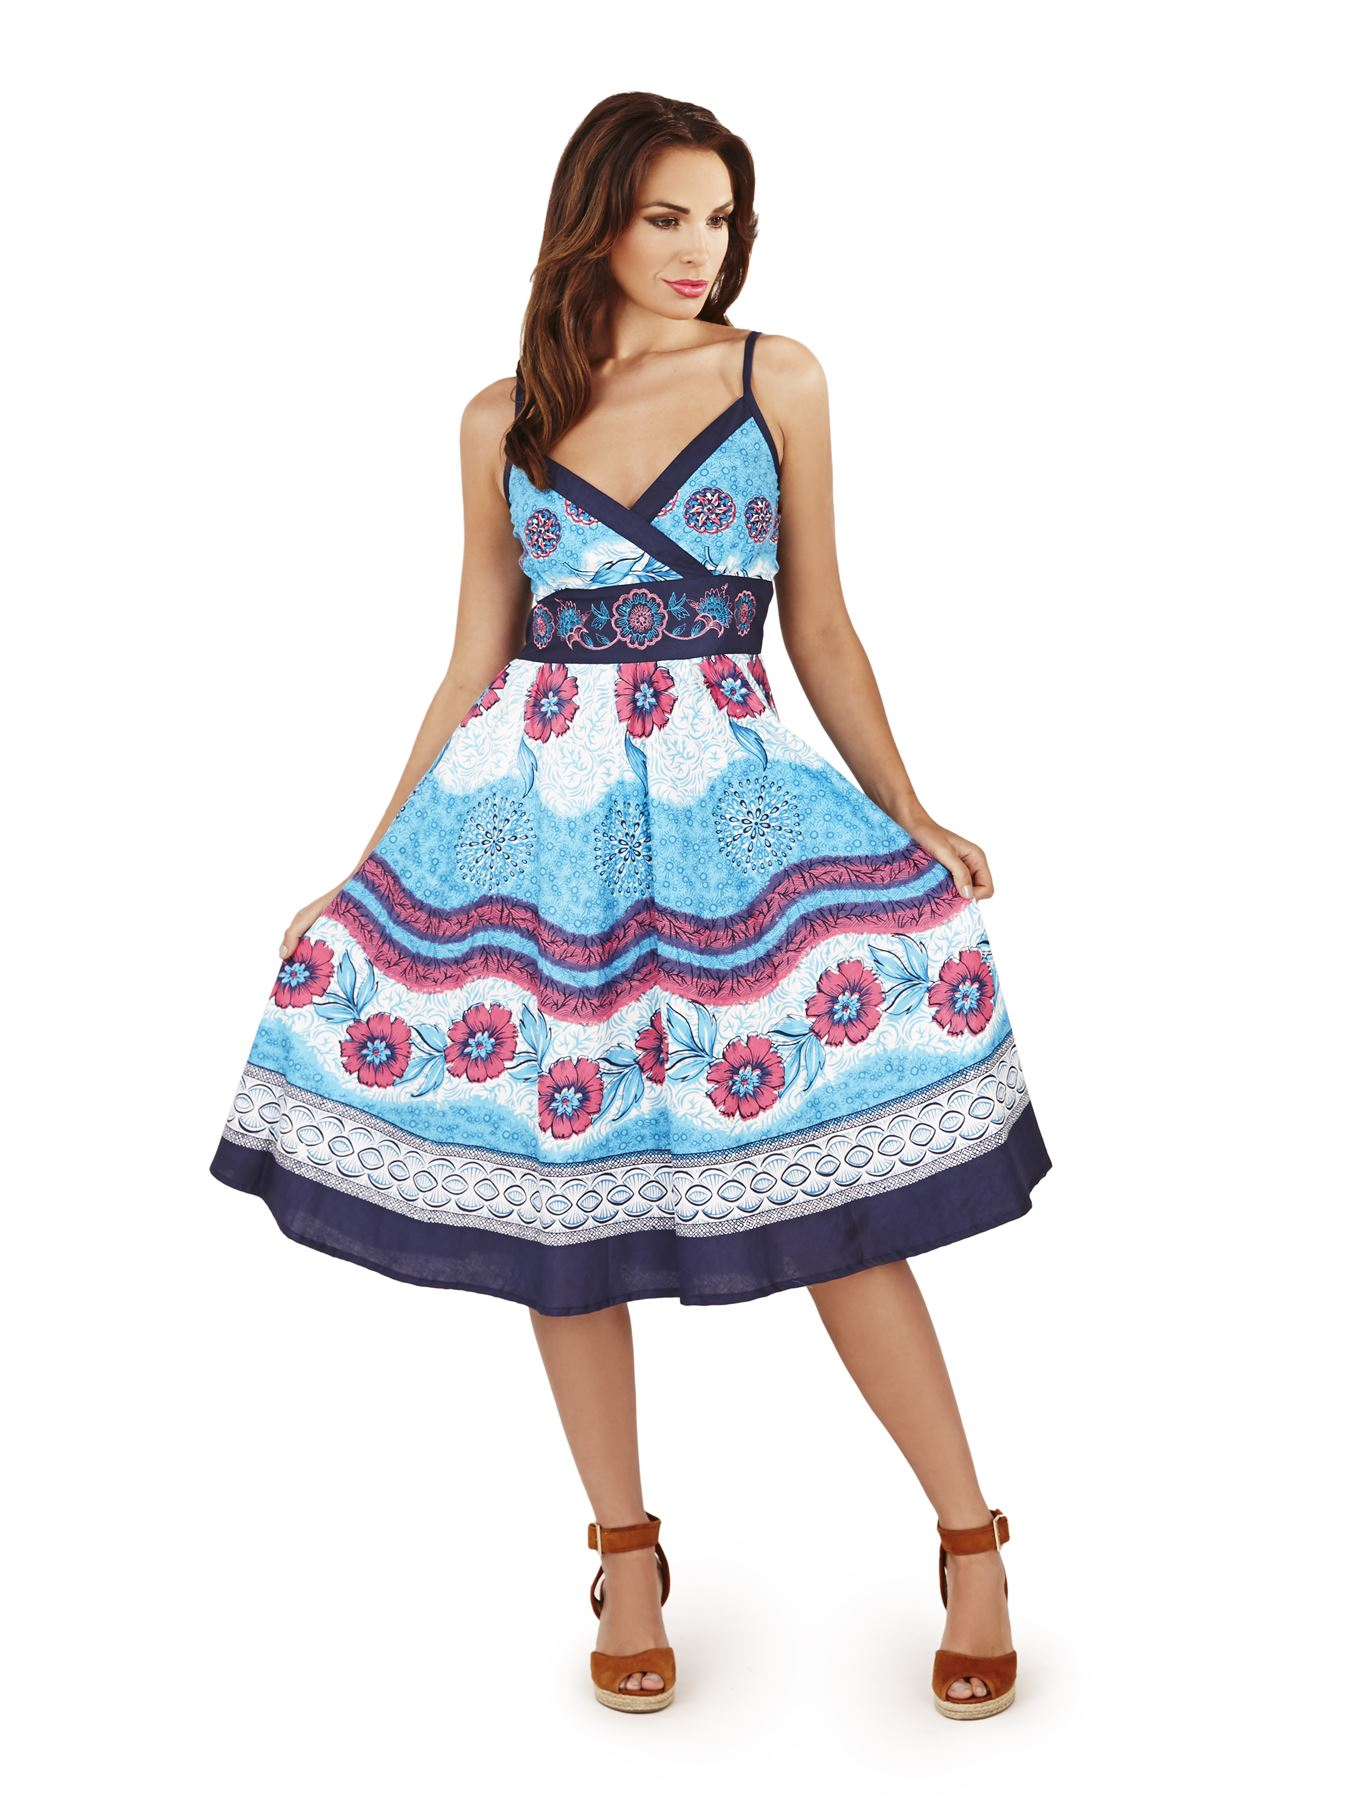 Turquoise summer dresses uk - Summer dress style